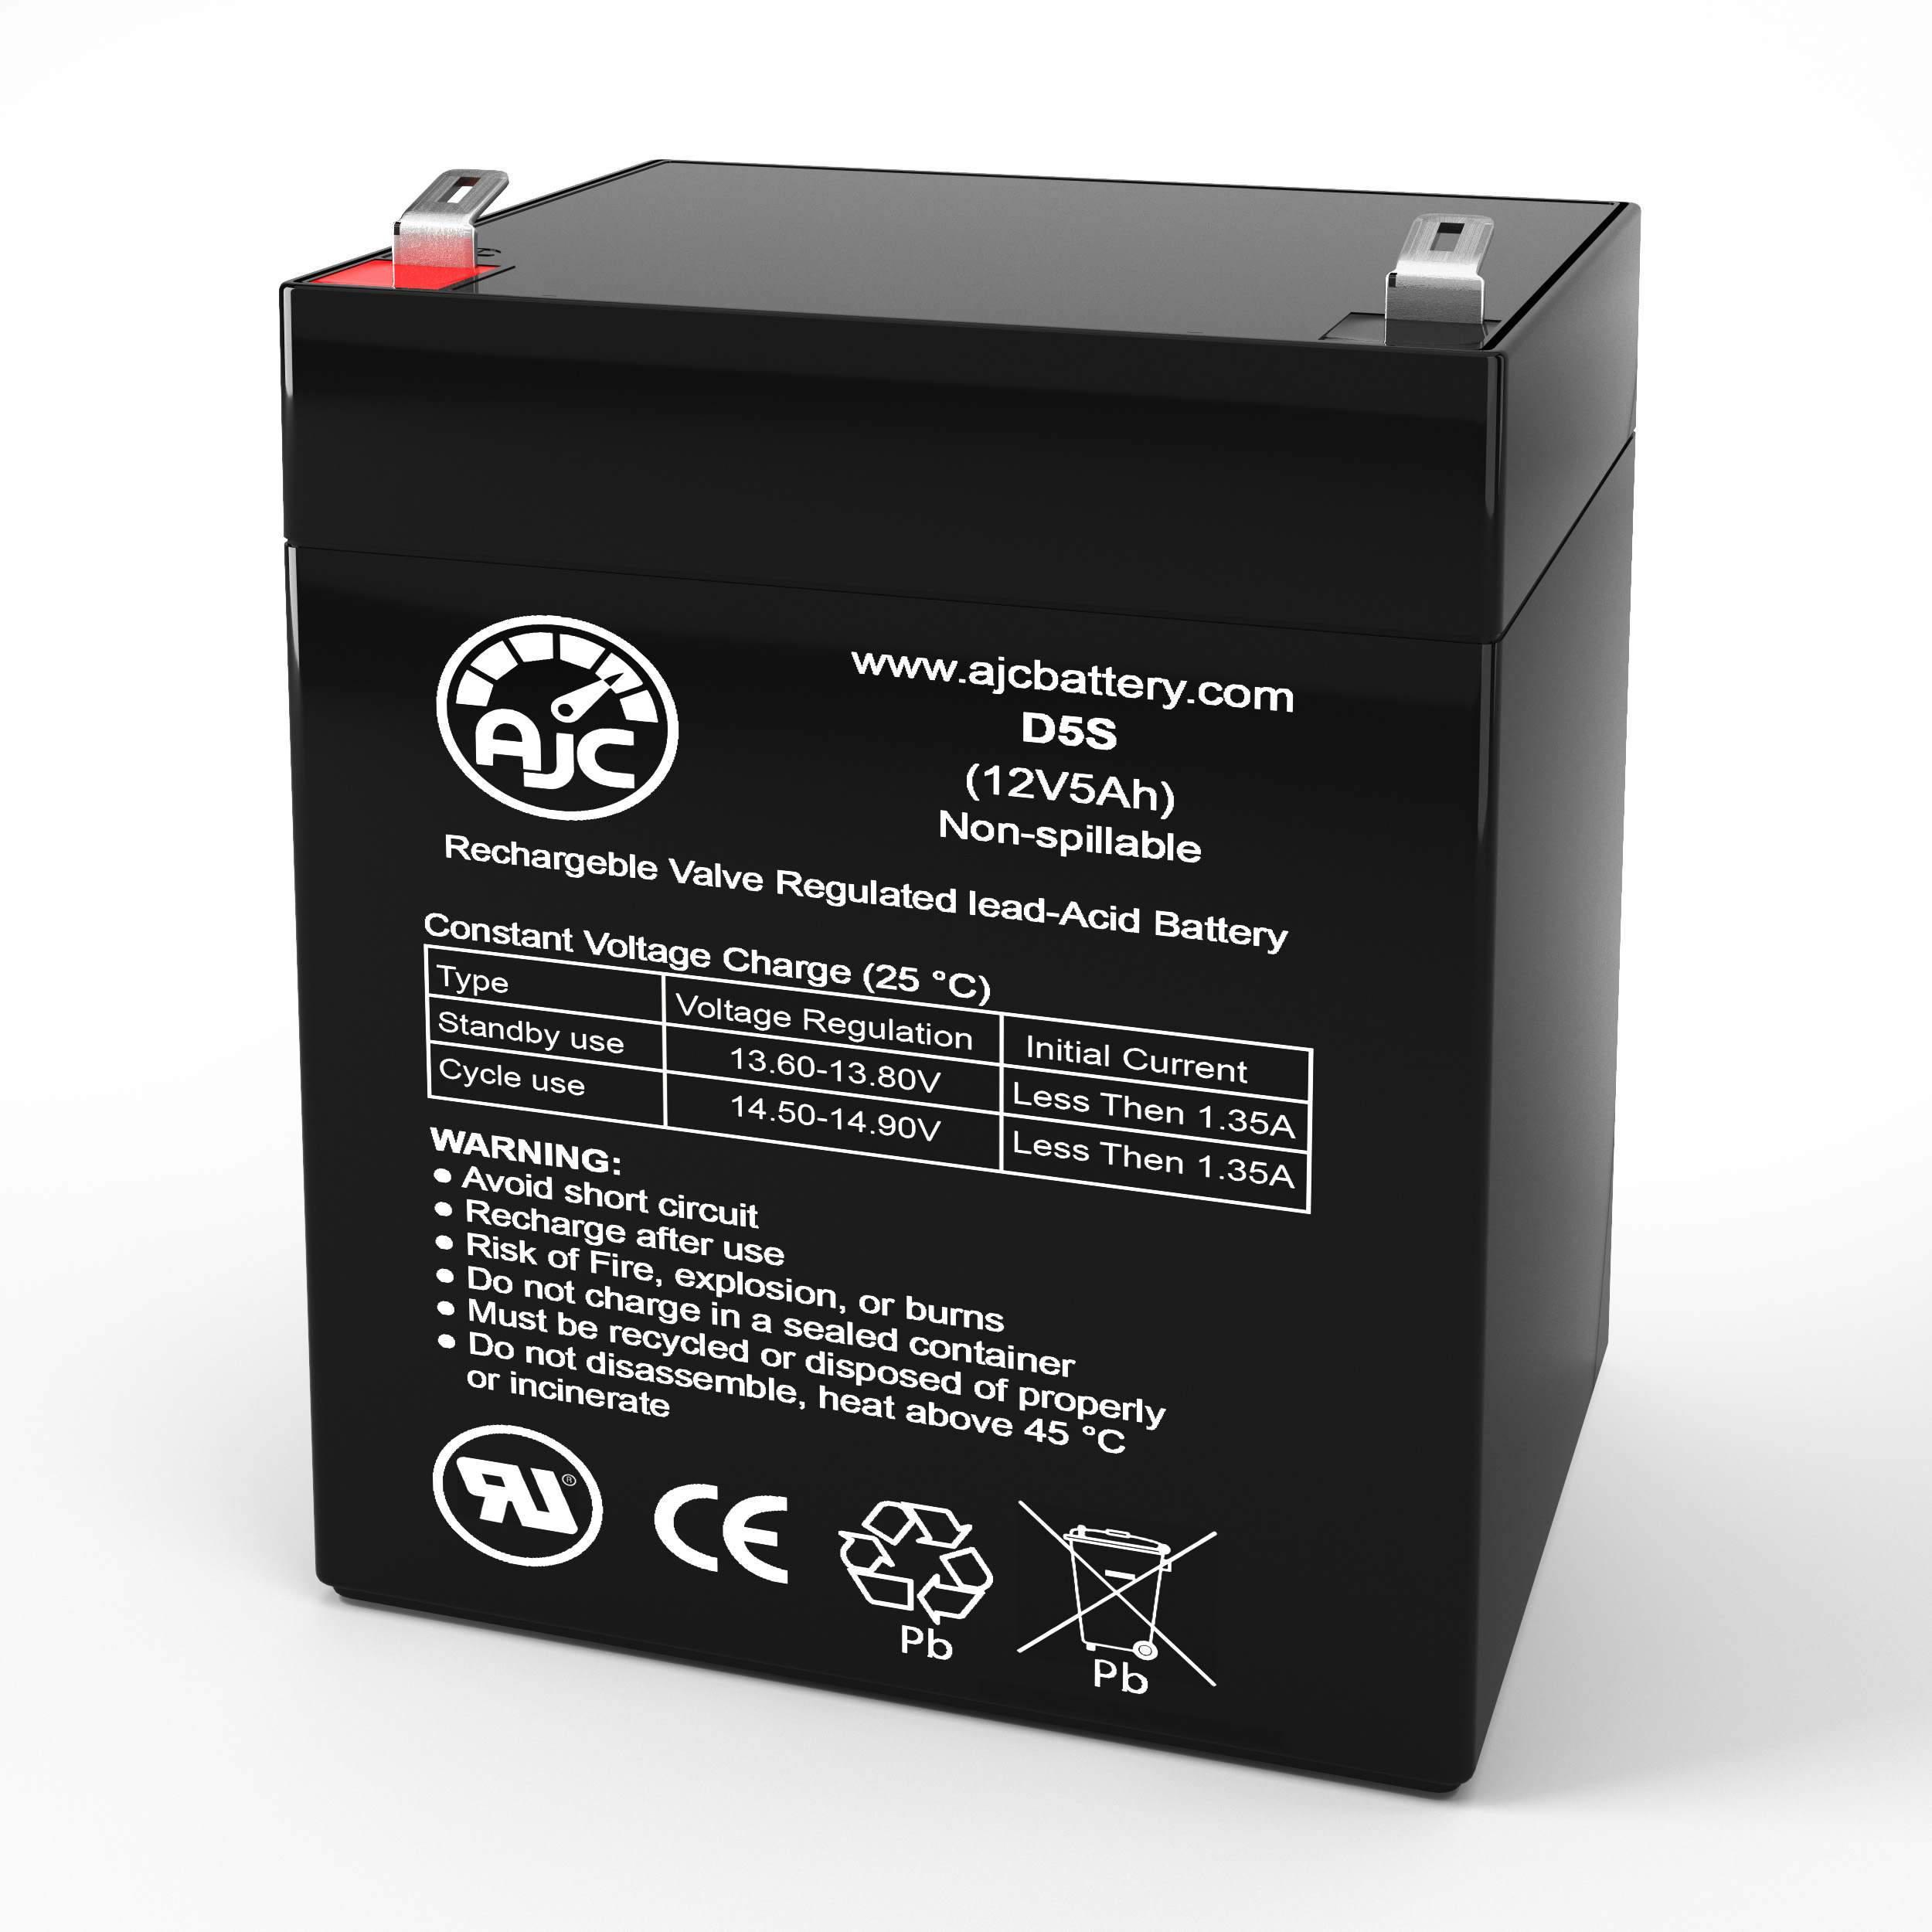 This is an AJC Brand Replacement Hewlett Packard R3000XR 12V 5Ah UPS Battery